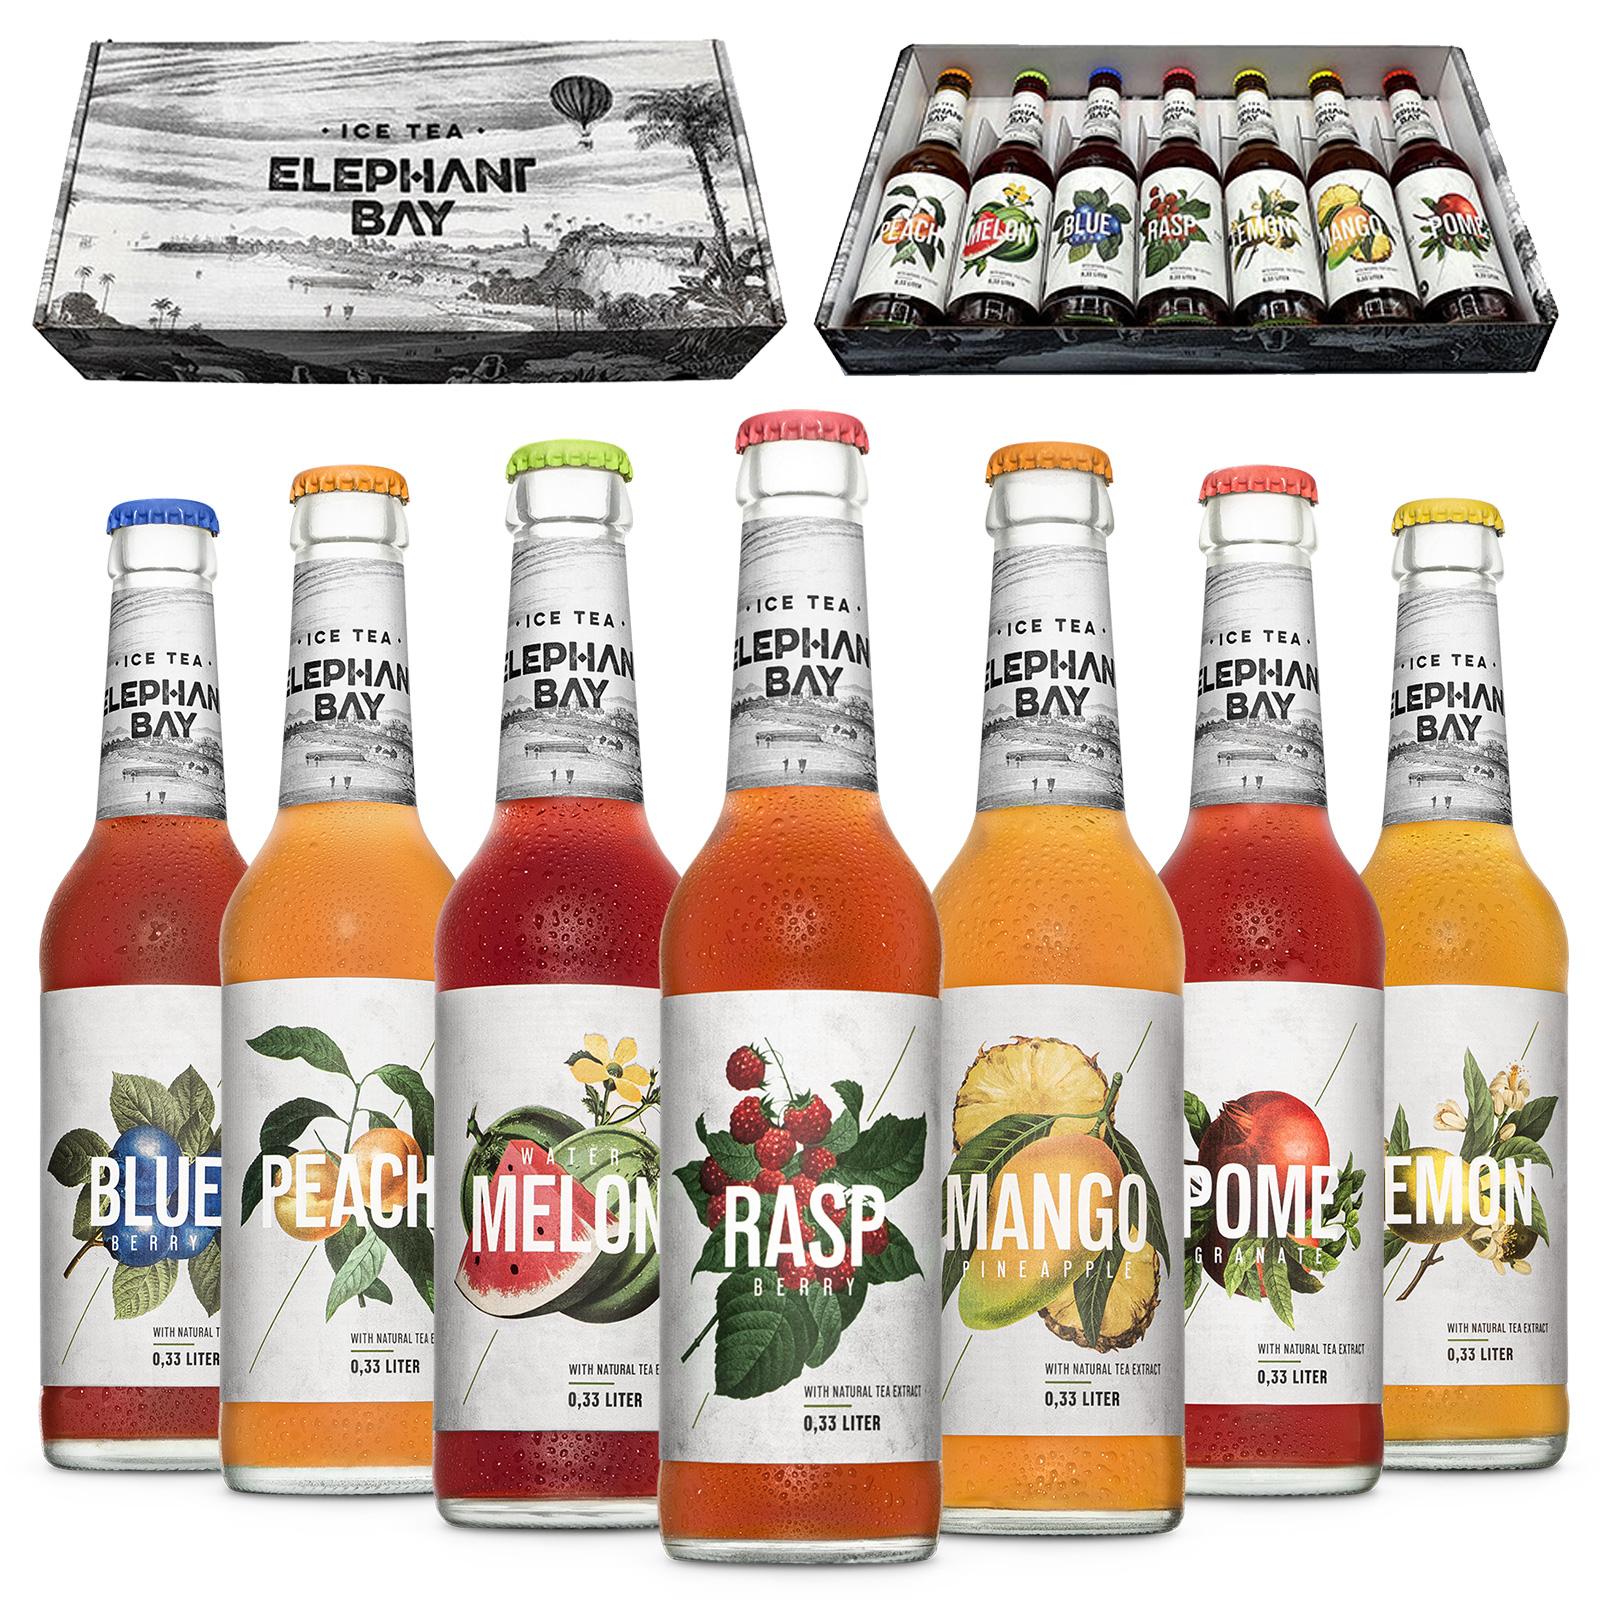 ICE TEA Eistee Elephant Bay - 7 Sorten Probier Set - Peach + Melon + Blueberry + Raspberry + Lemon + Mango + Pomegranate je 330ml